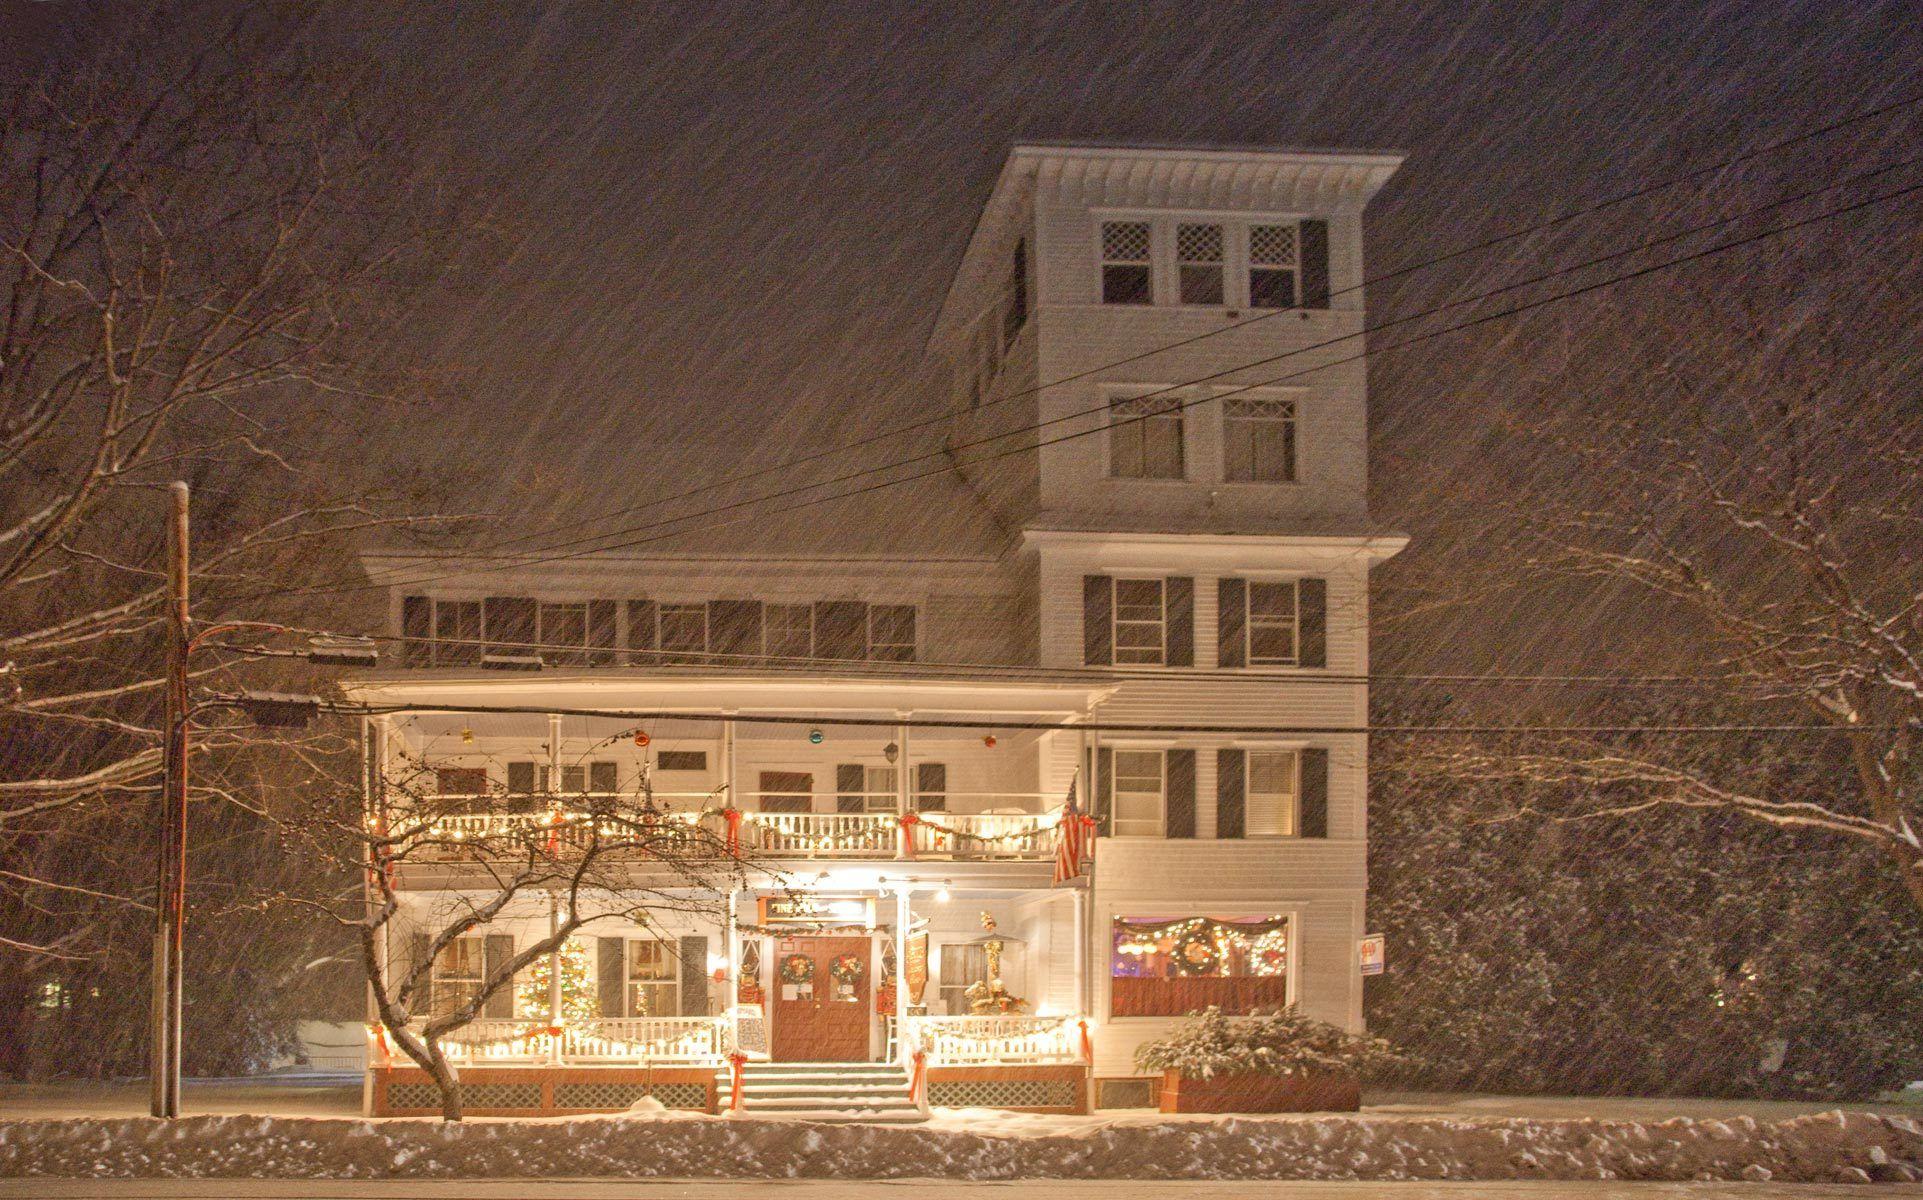 Saxtons River Inn during a Winter Storm